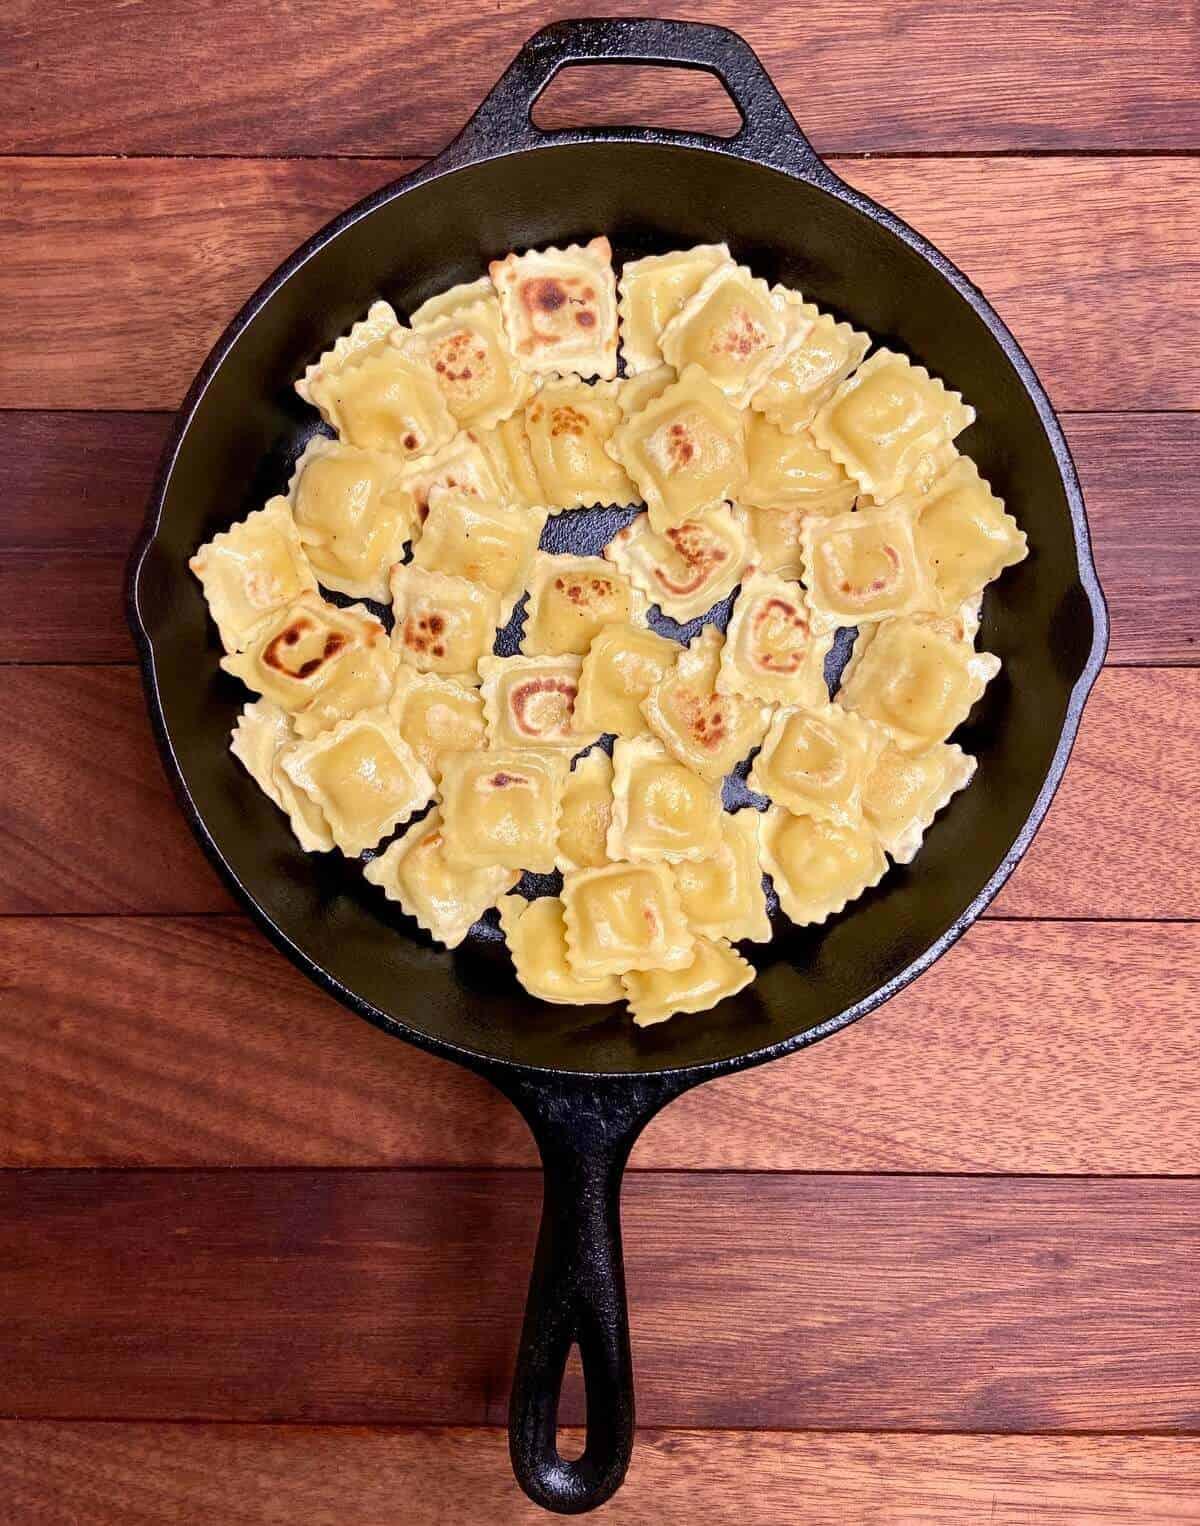 Crispy Ravioli Formaggi (Photo by Viana Boenzli)